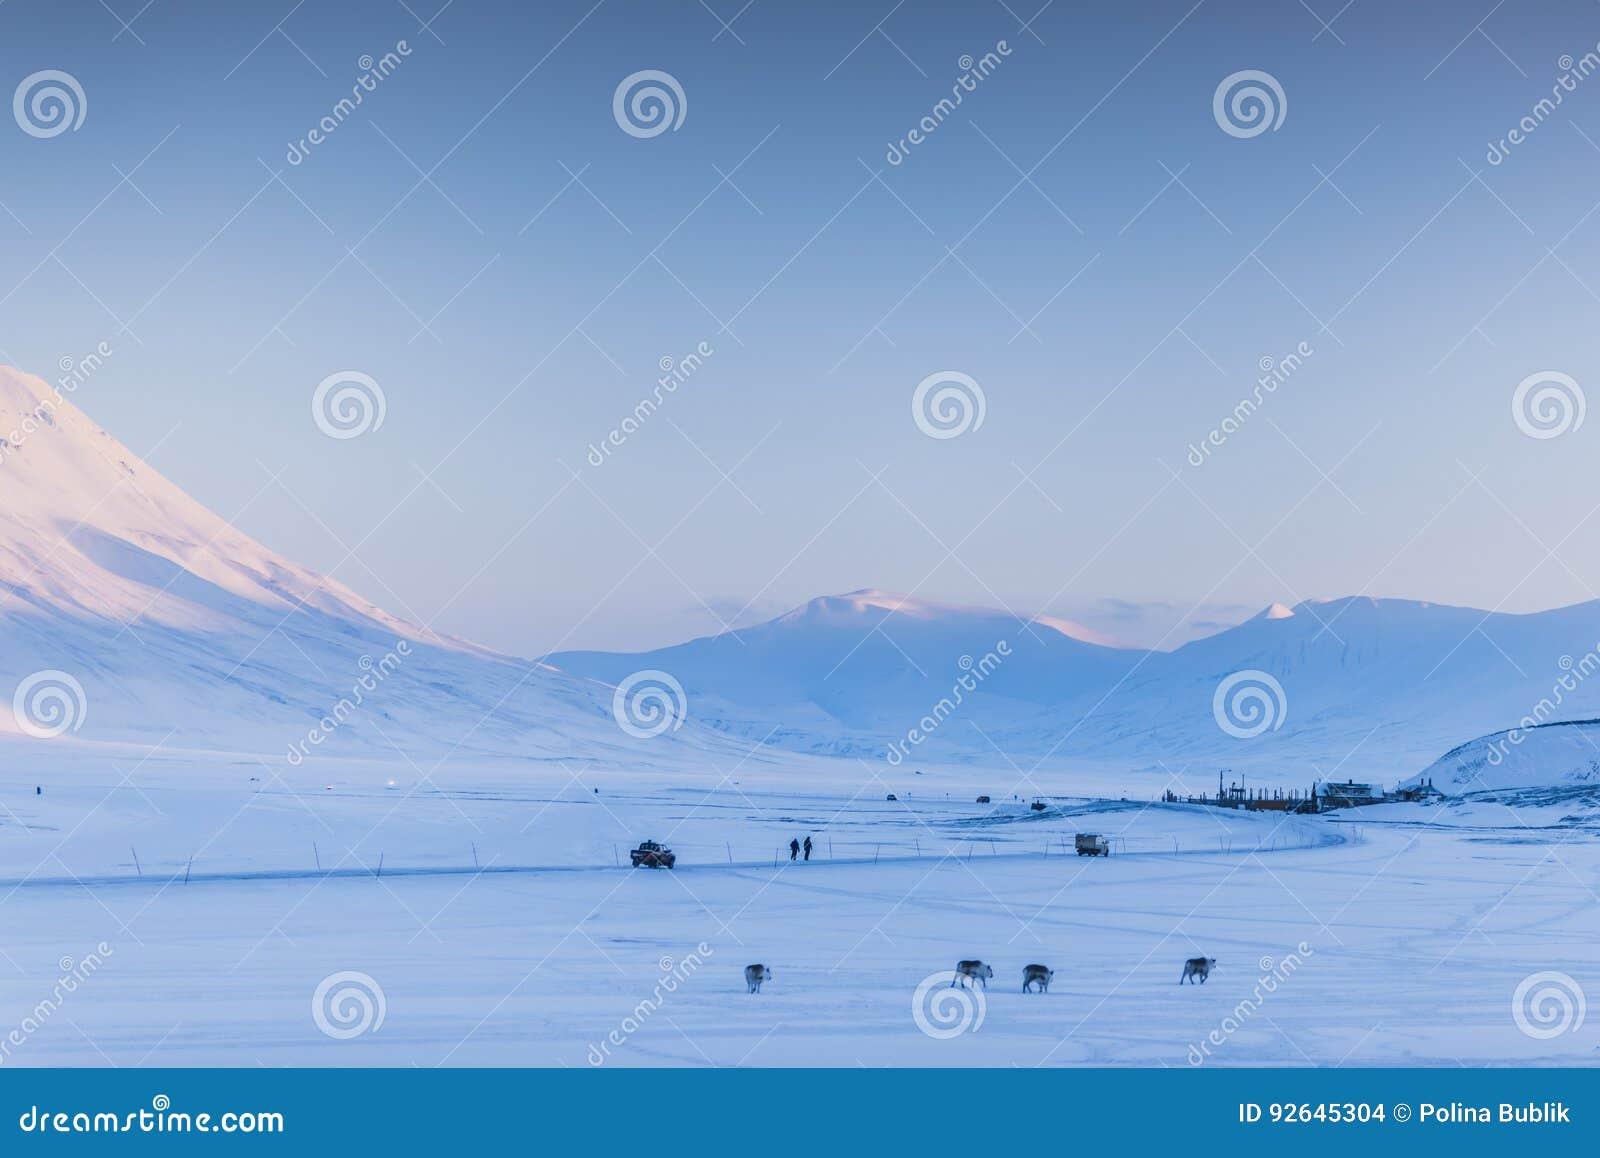 Mountain Nature Svalbard Longyearbyen Svalbard Norway With